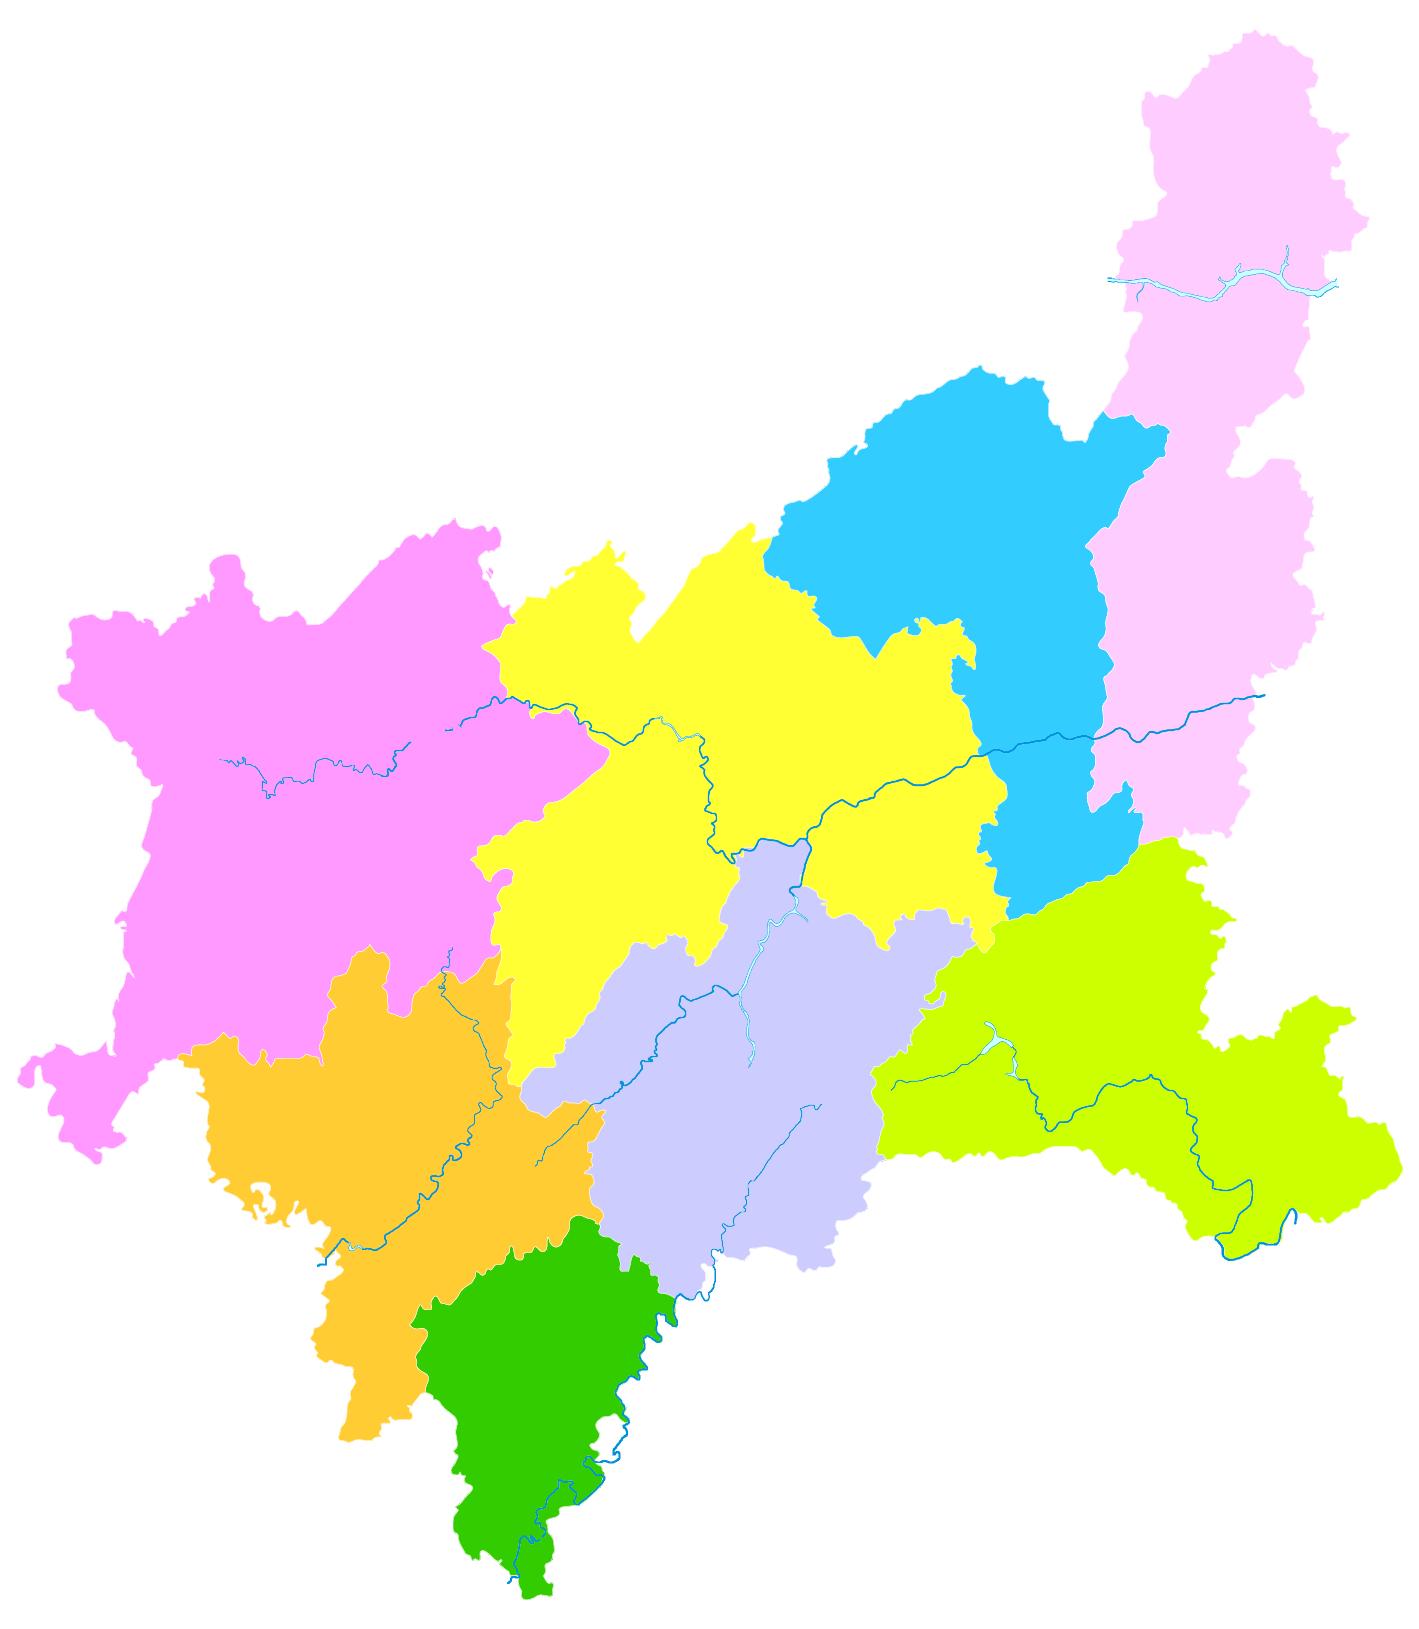 FileAdministrative Division Enshipng Wikimedia Commons - Enshi map